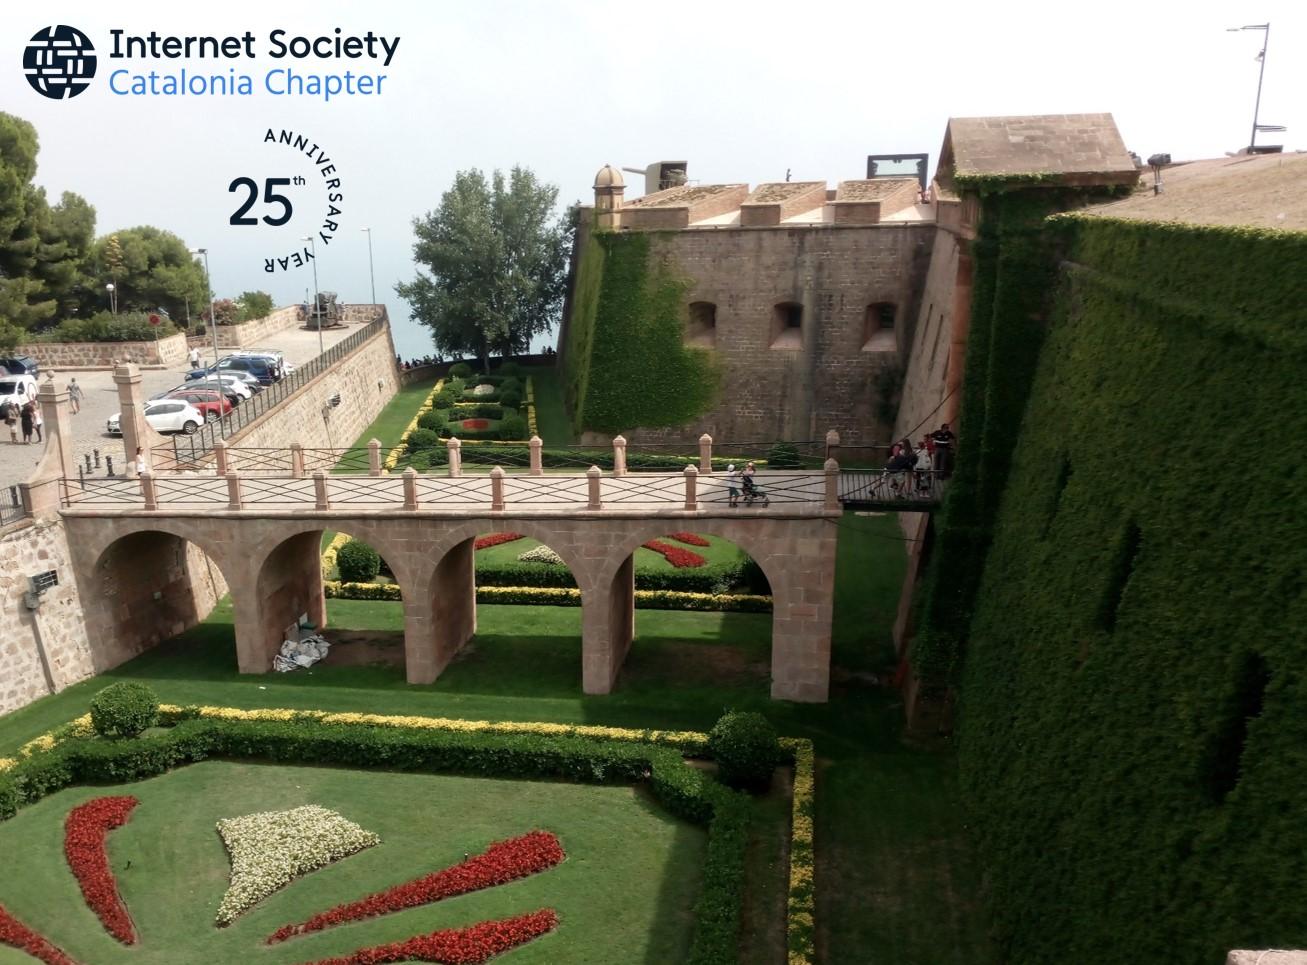 Festa 25 anys al Castell de Montjuïc